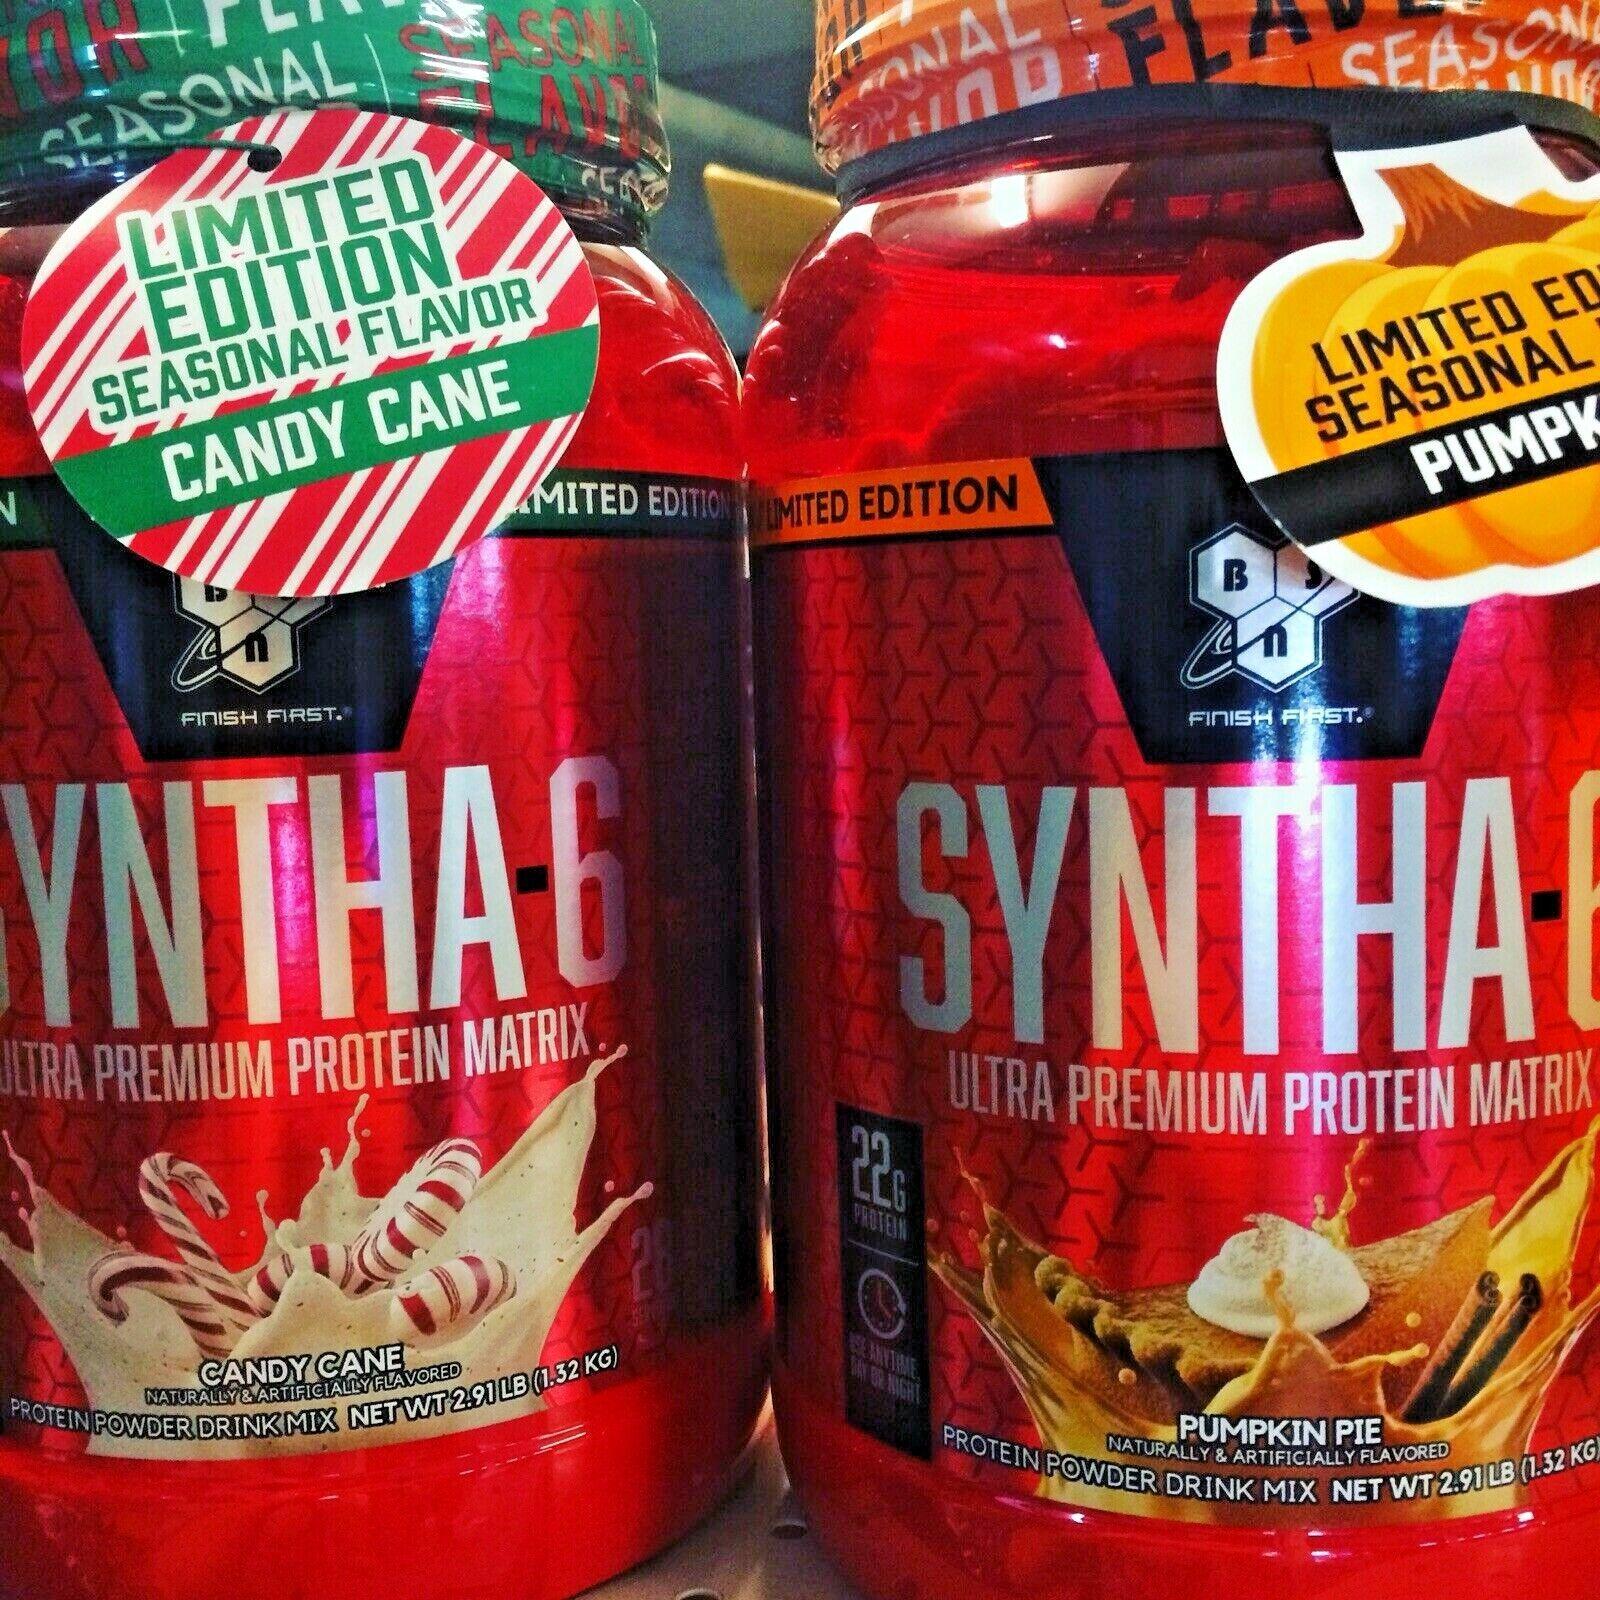 BSN Syntha-6 Ultra Premium Lean Muscle Protein  2.91 lbs LIM